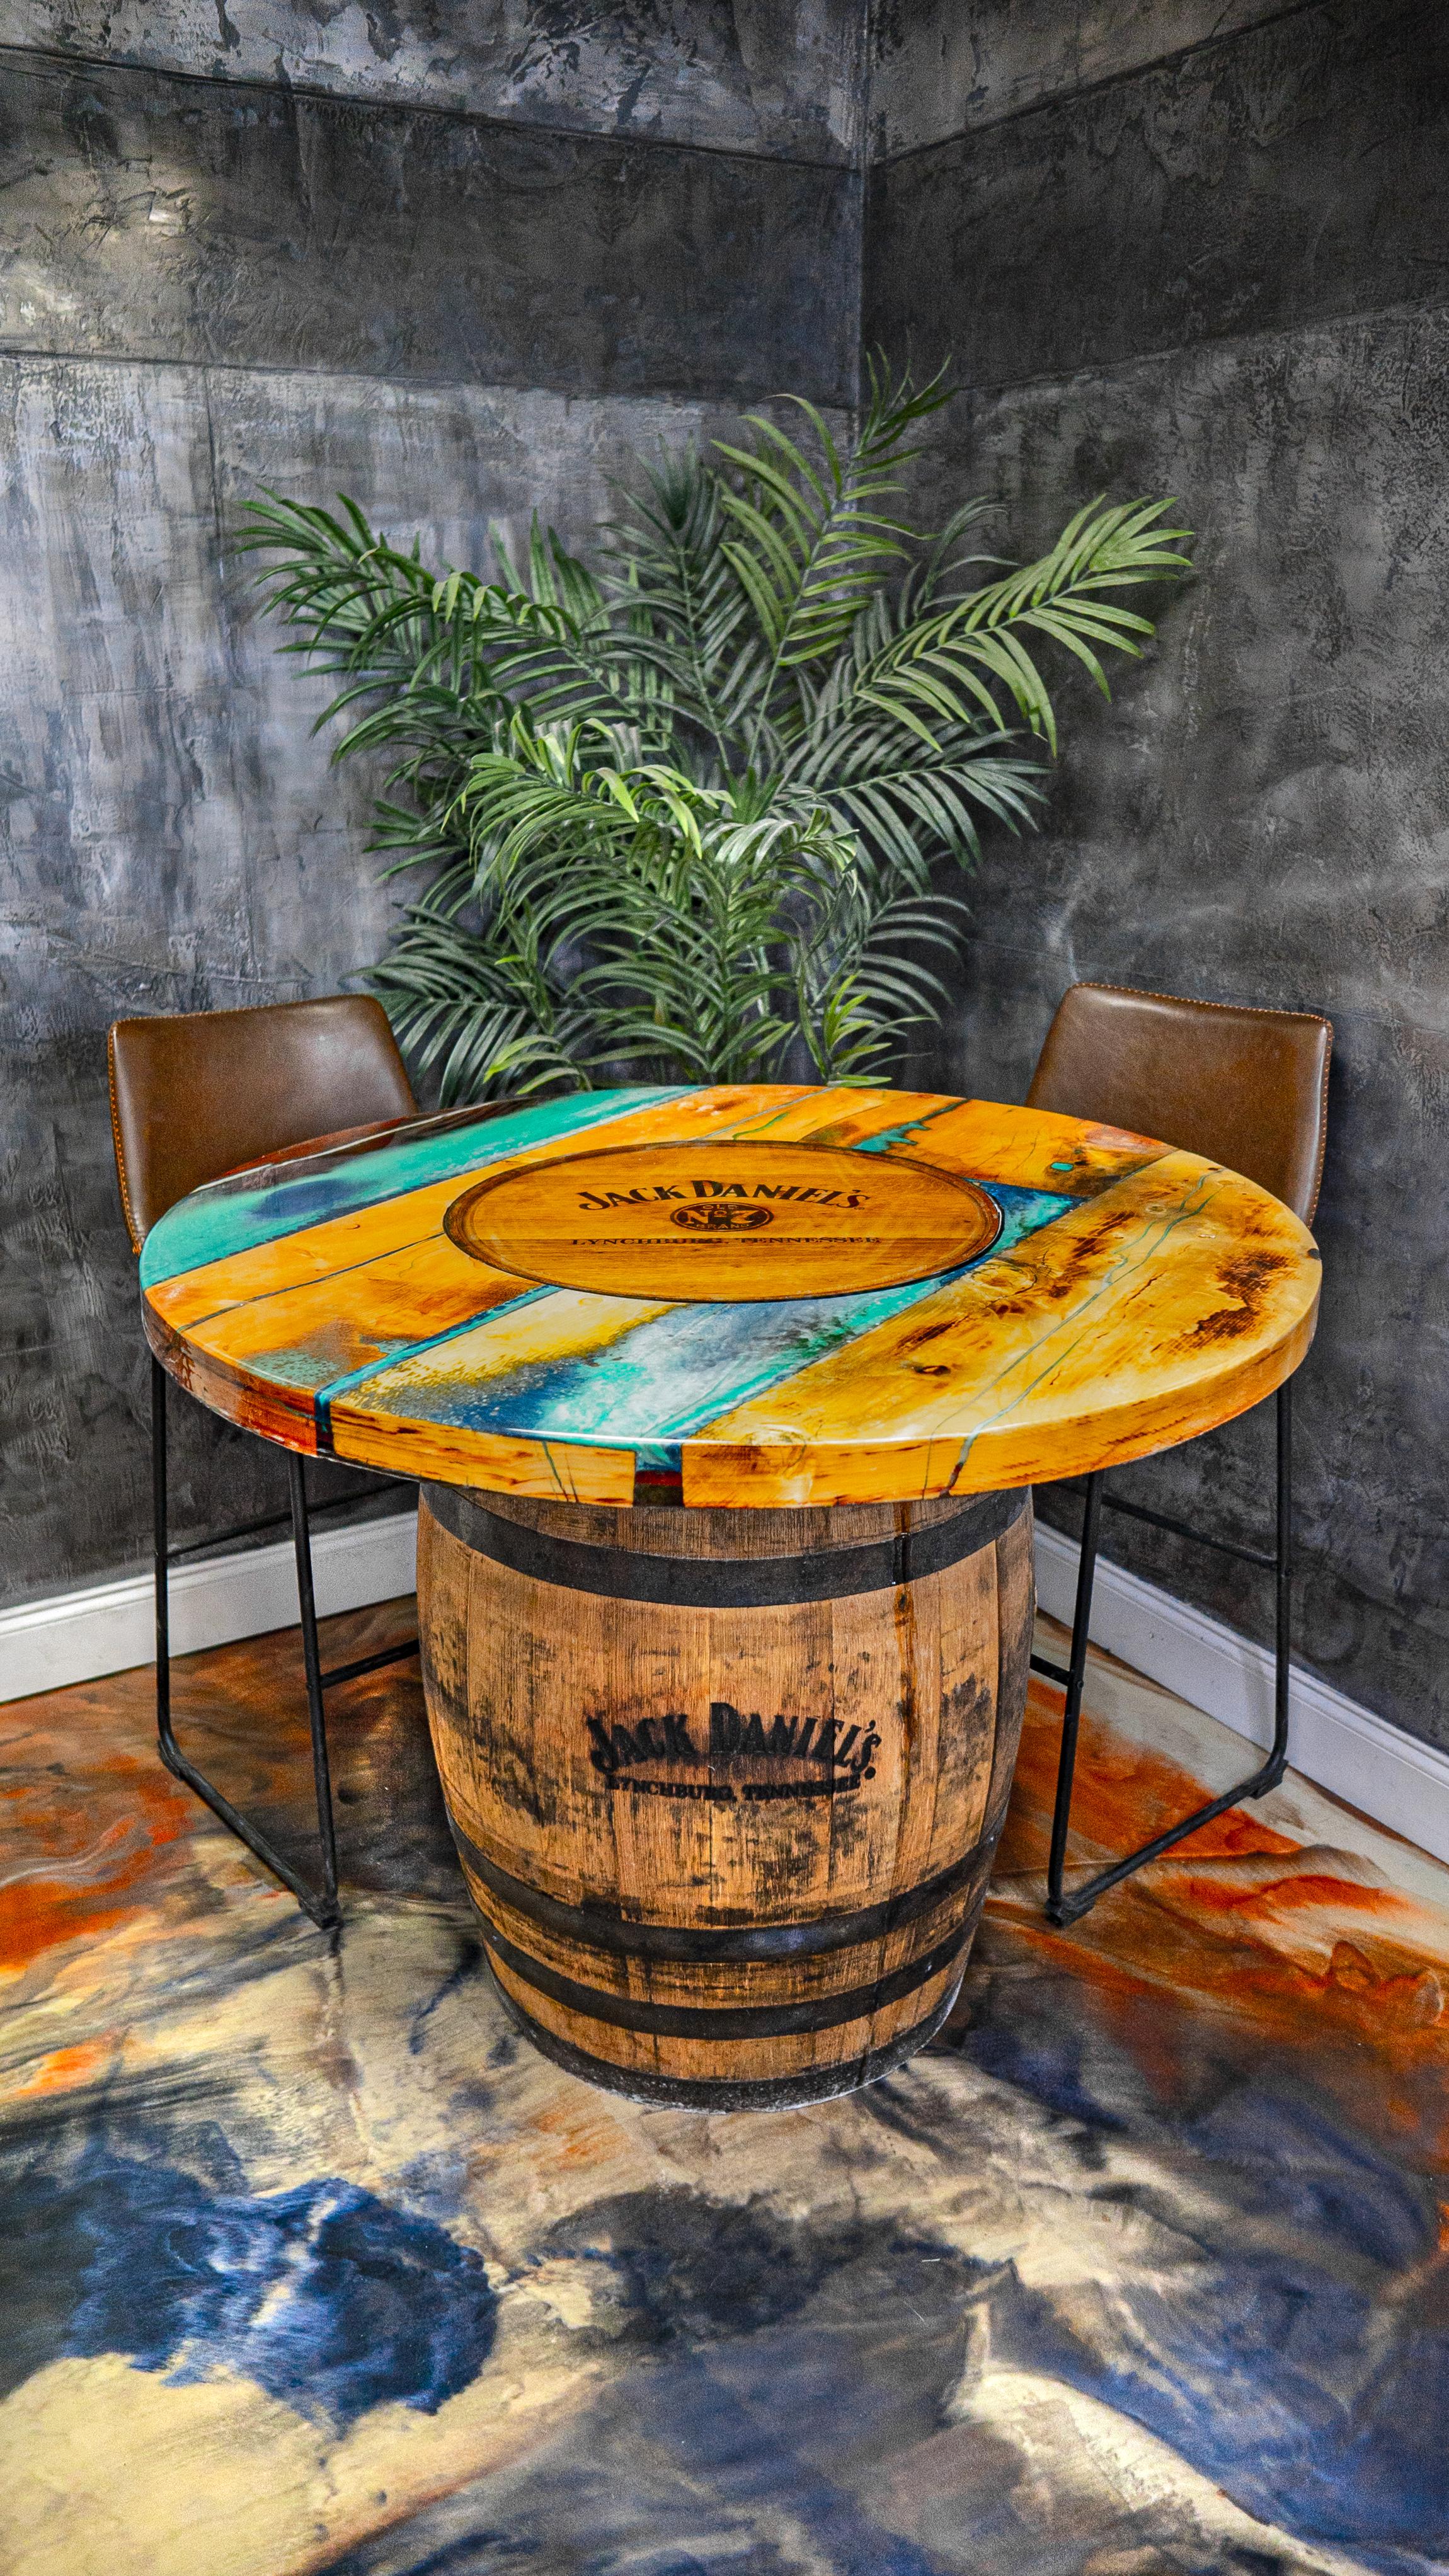 jack-daniels-epoxy-table.jpg